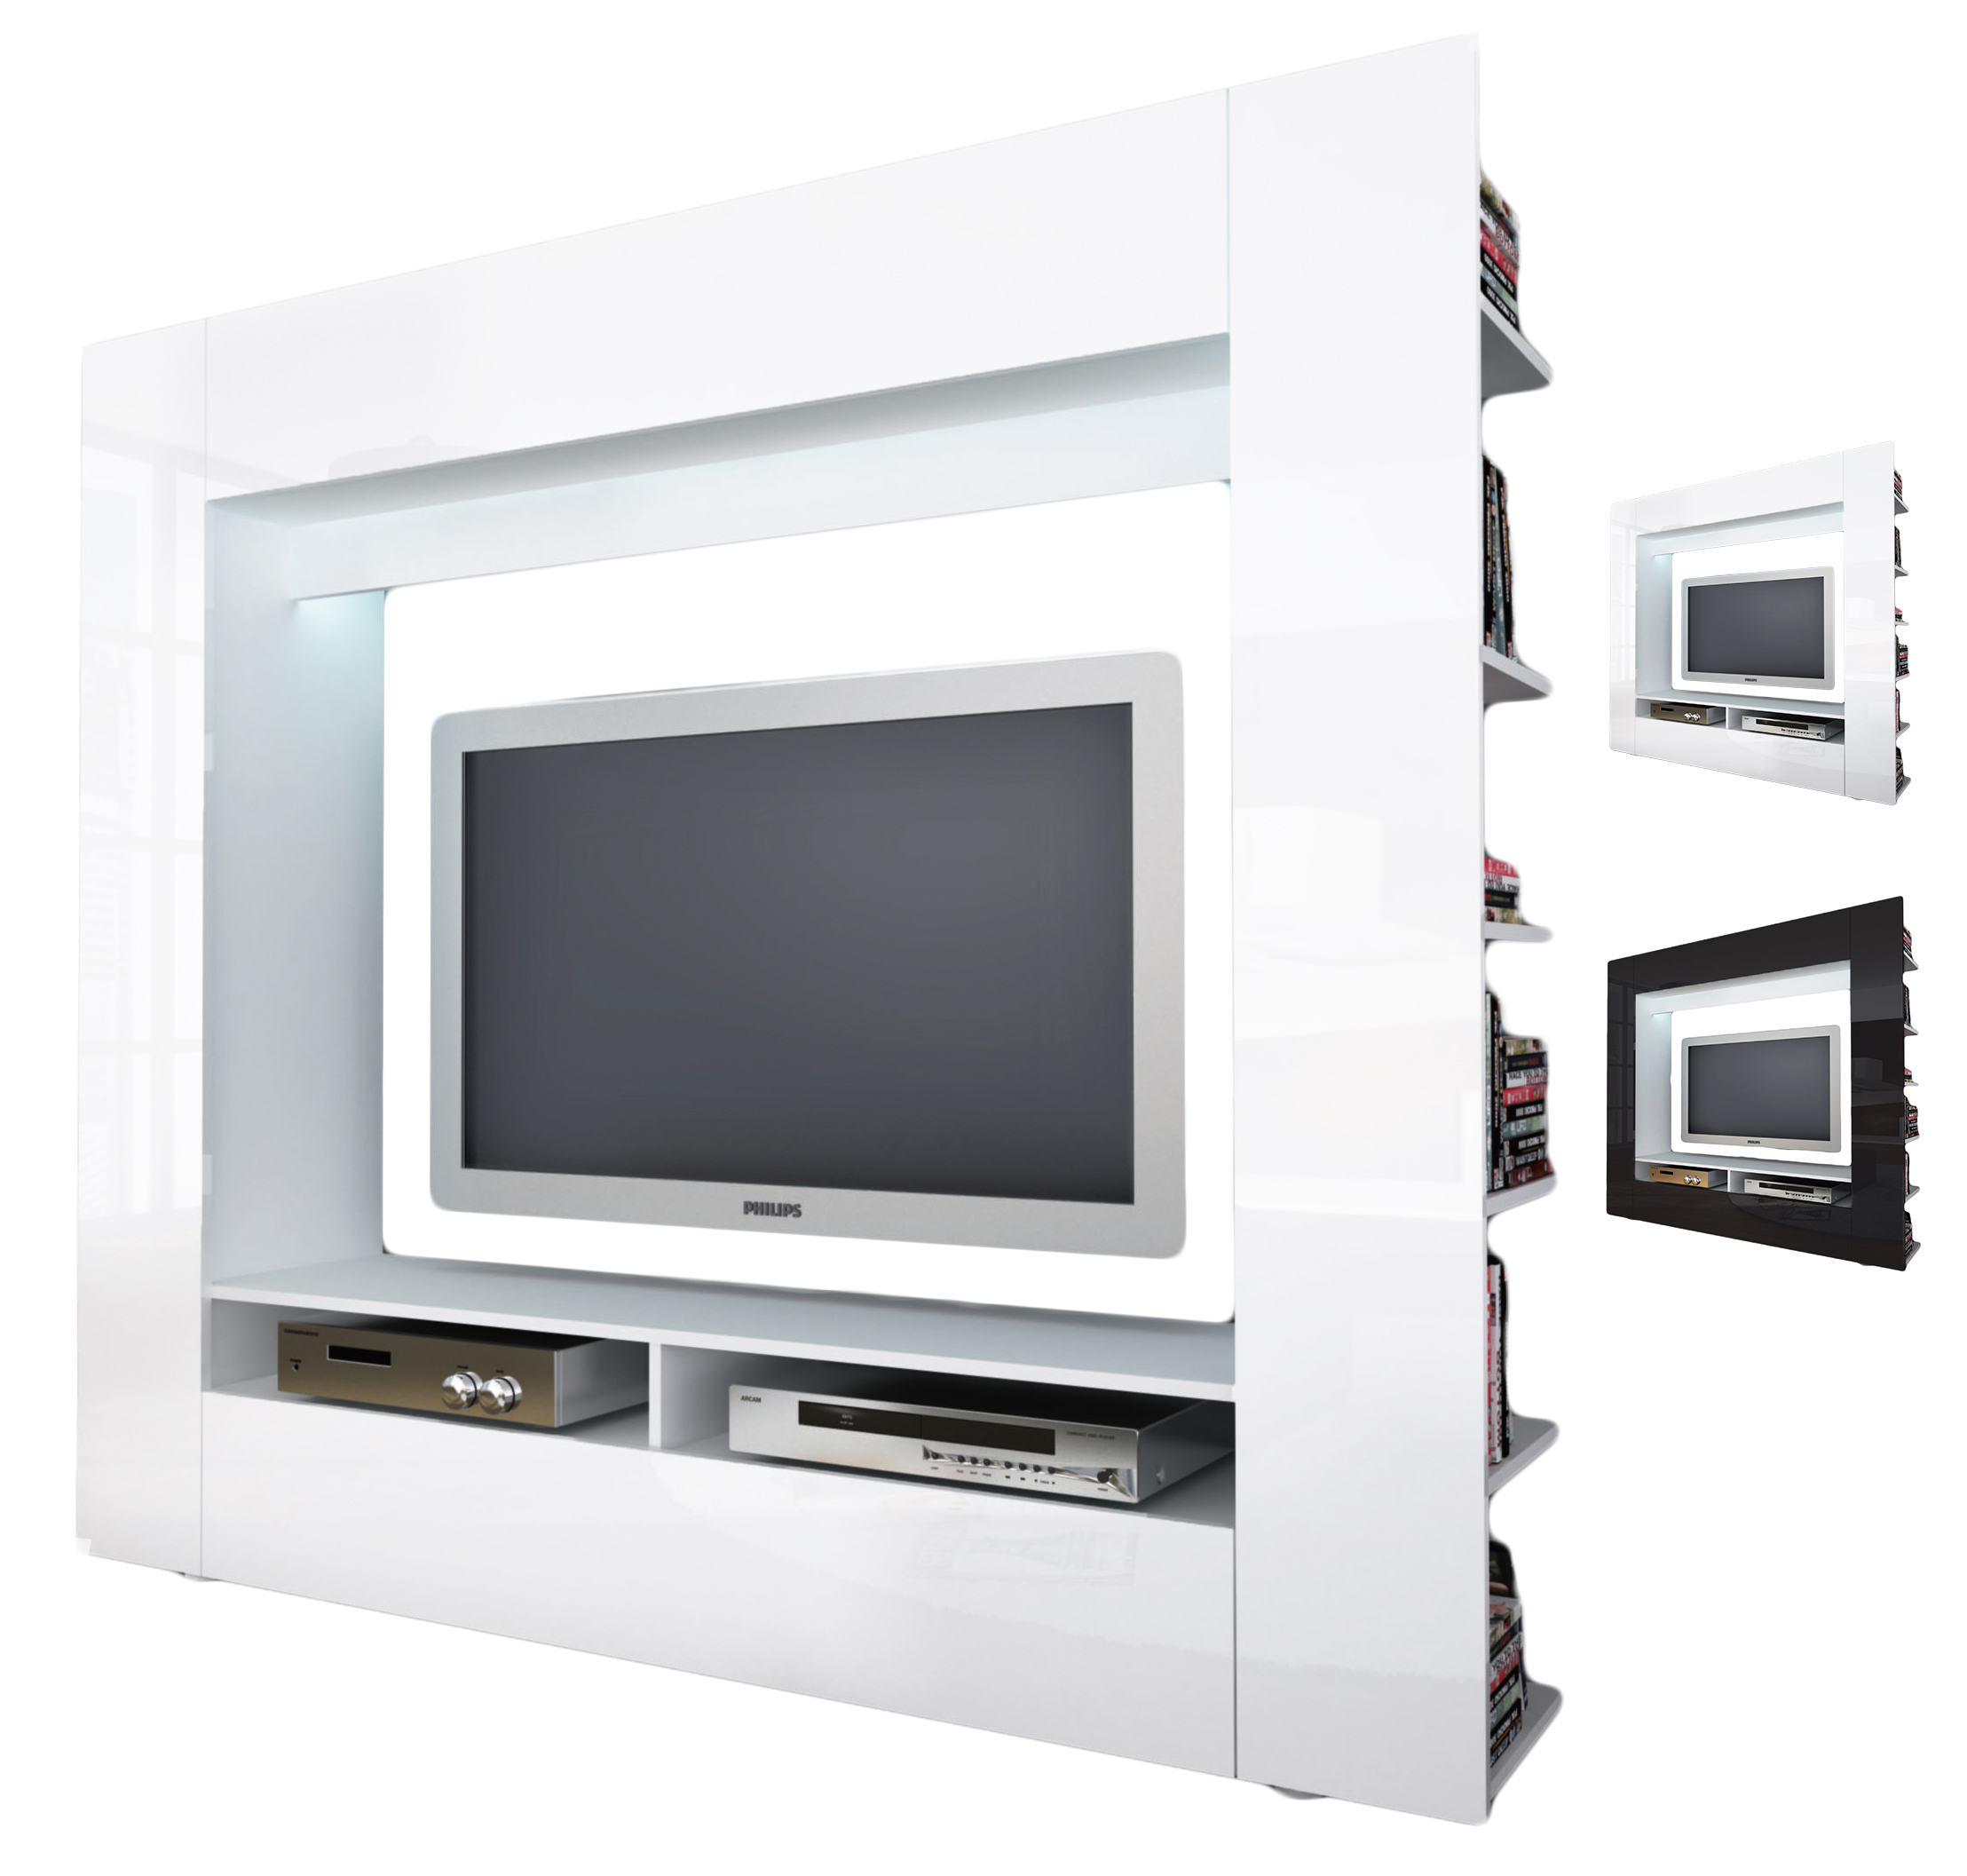 anbauwand wohnwand moderne multimediacenter wei schwarz. Black Bedroom Furniture Sets. Home Design Ideas